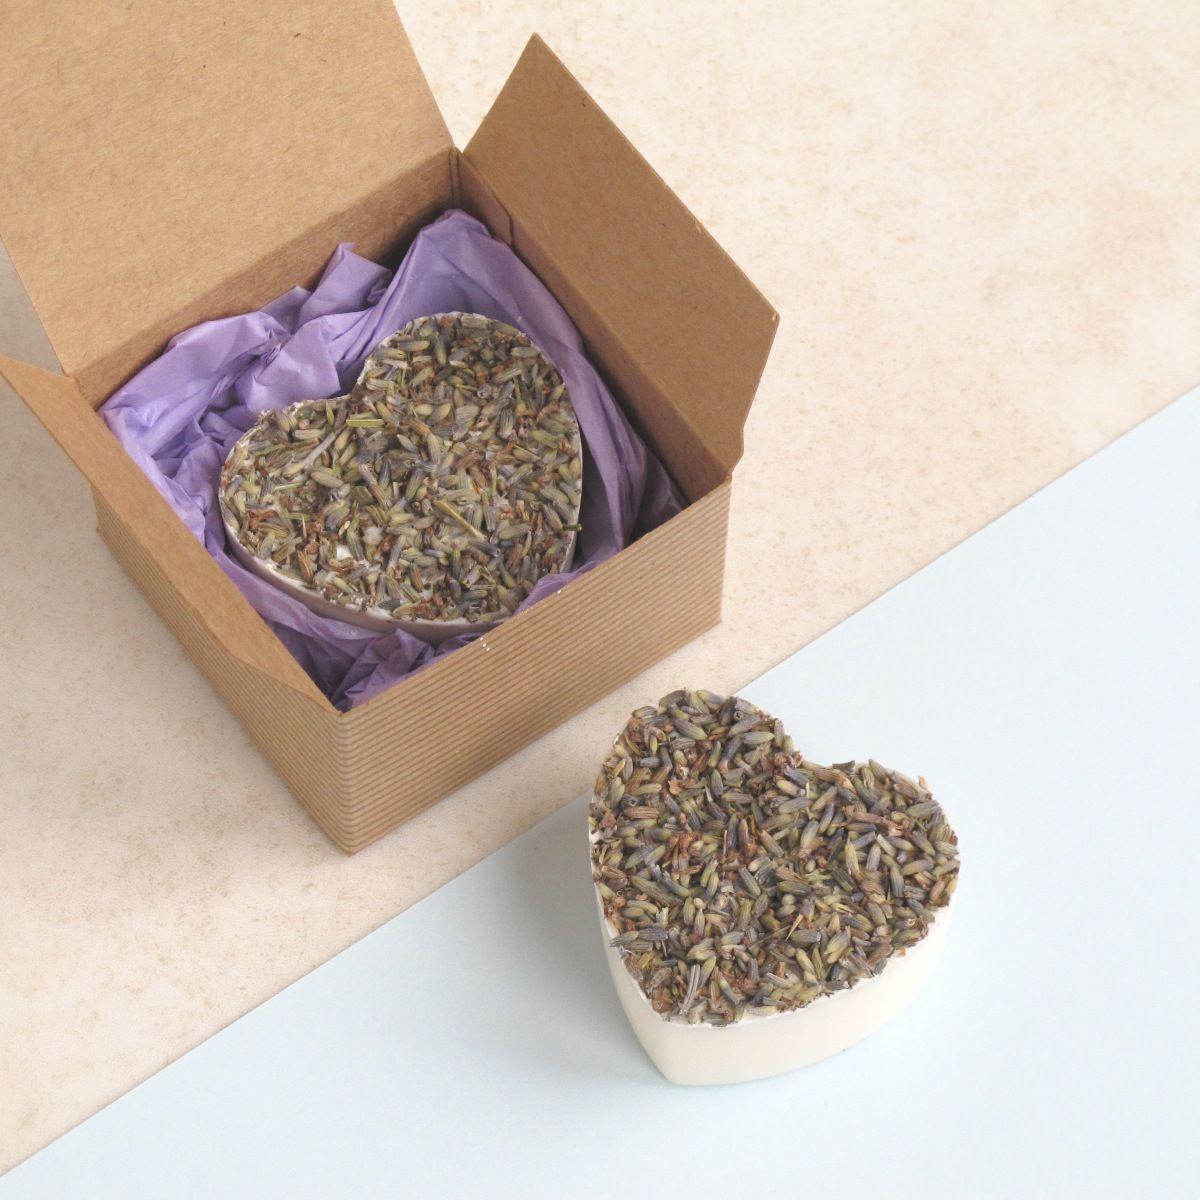 Wild Lavender Heart Soap by Lovely Soap Company